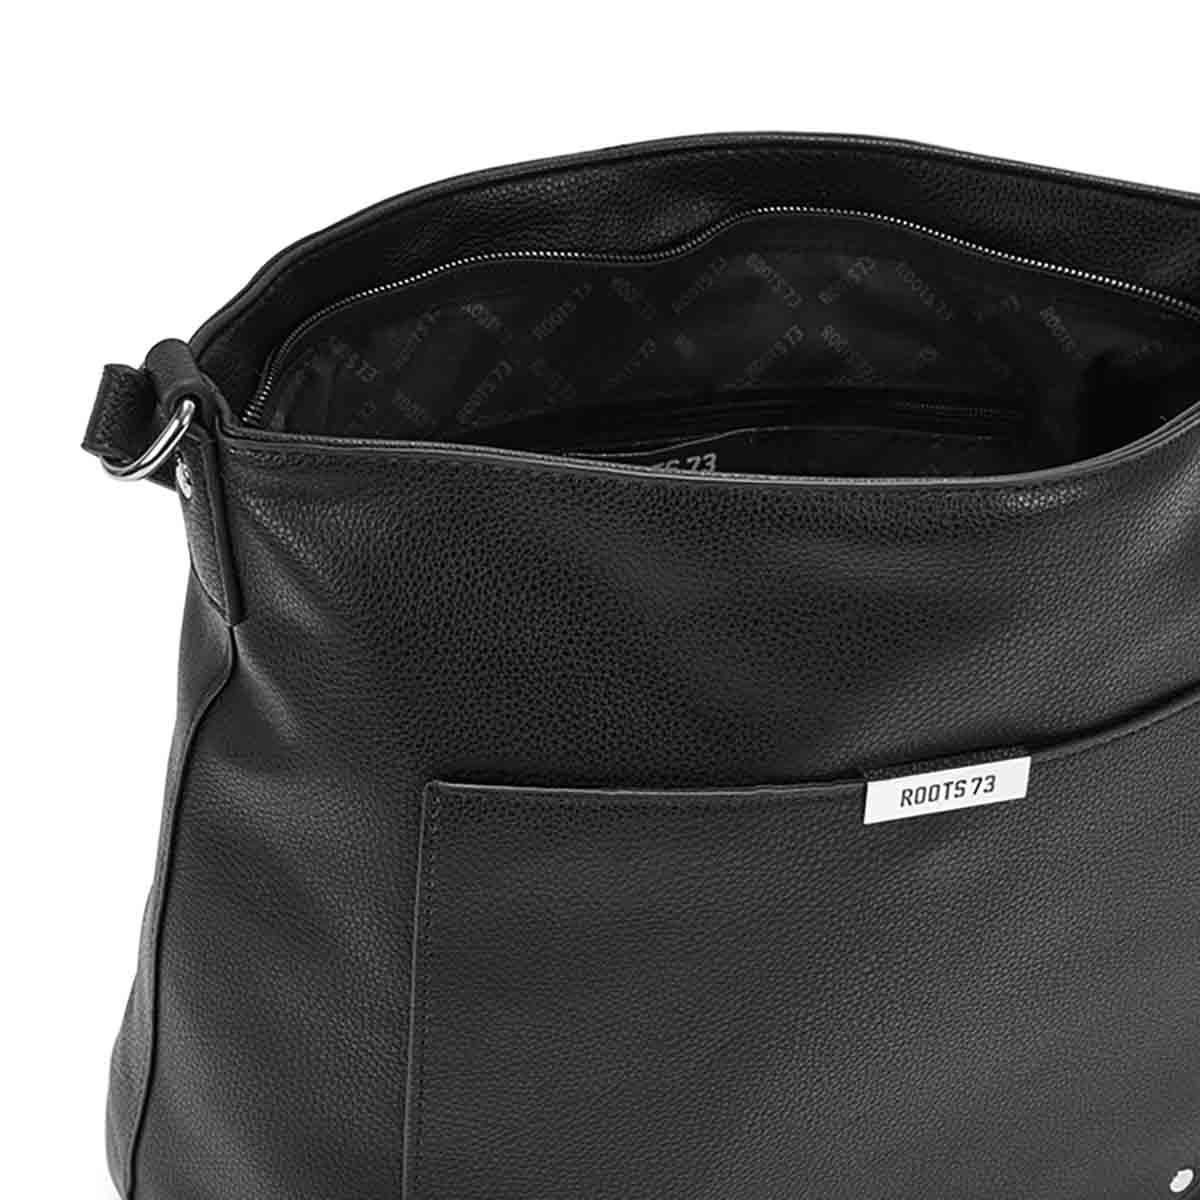 LdsRoots73 black square hobo bag